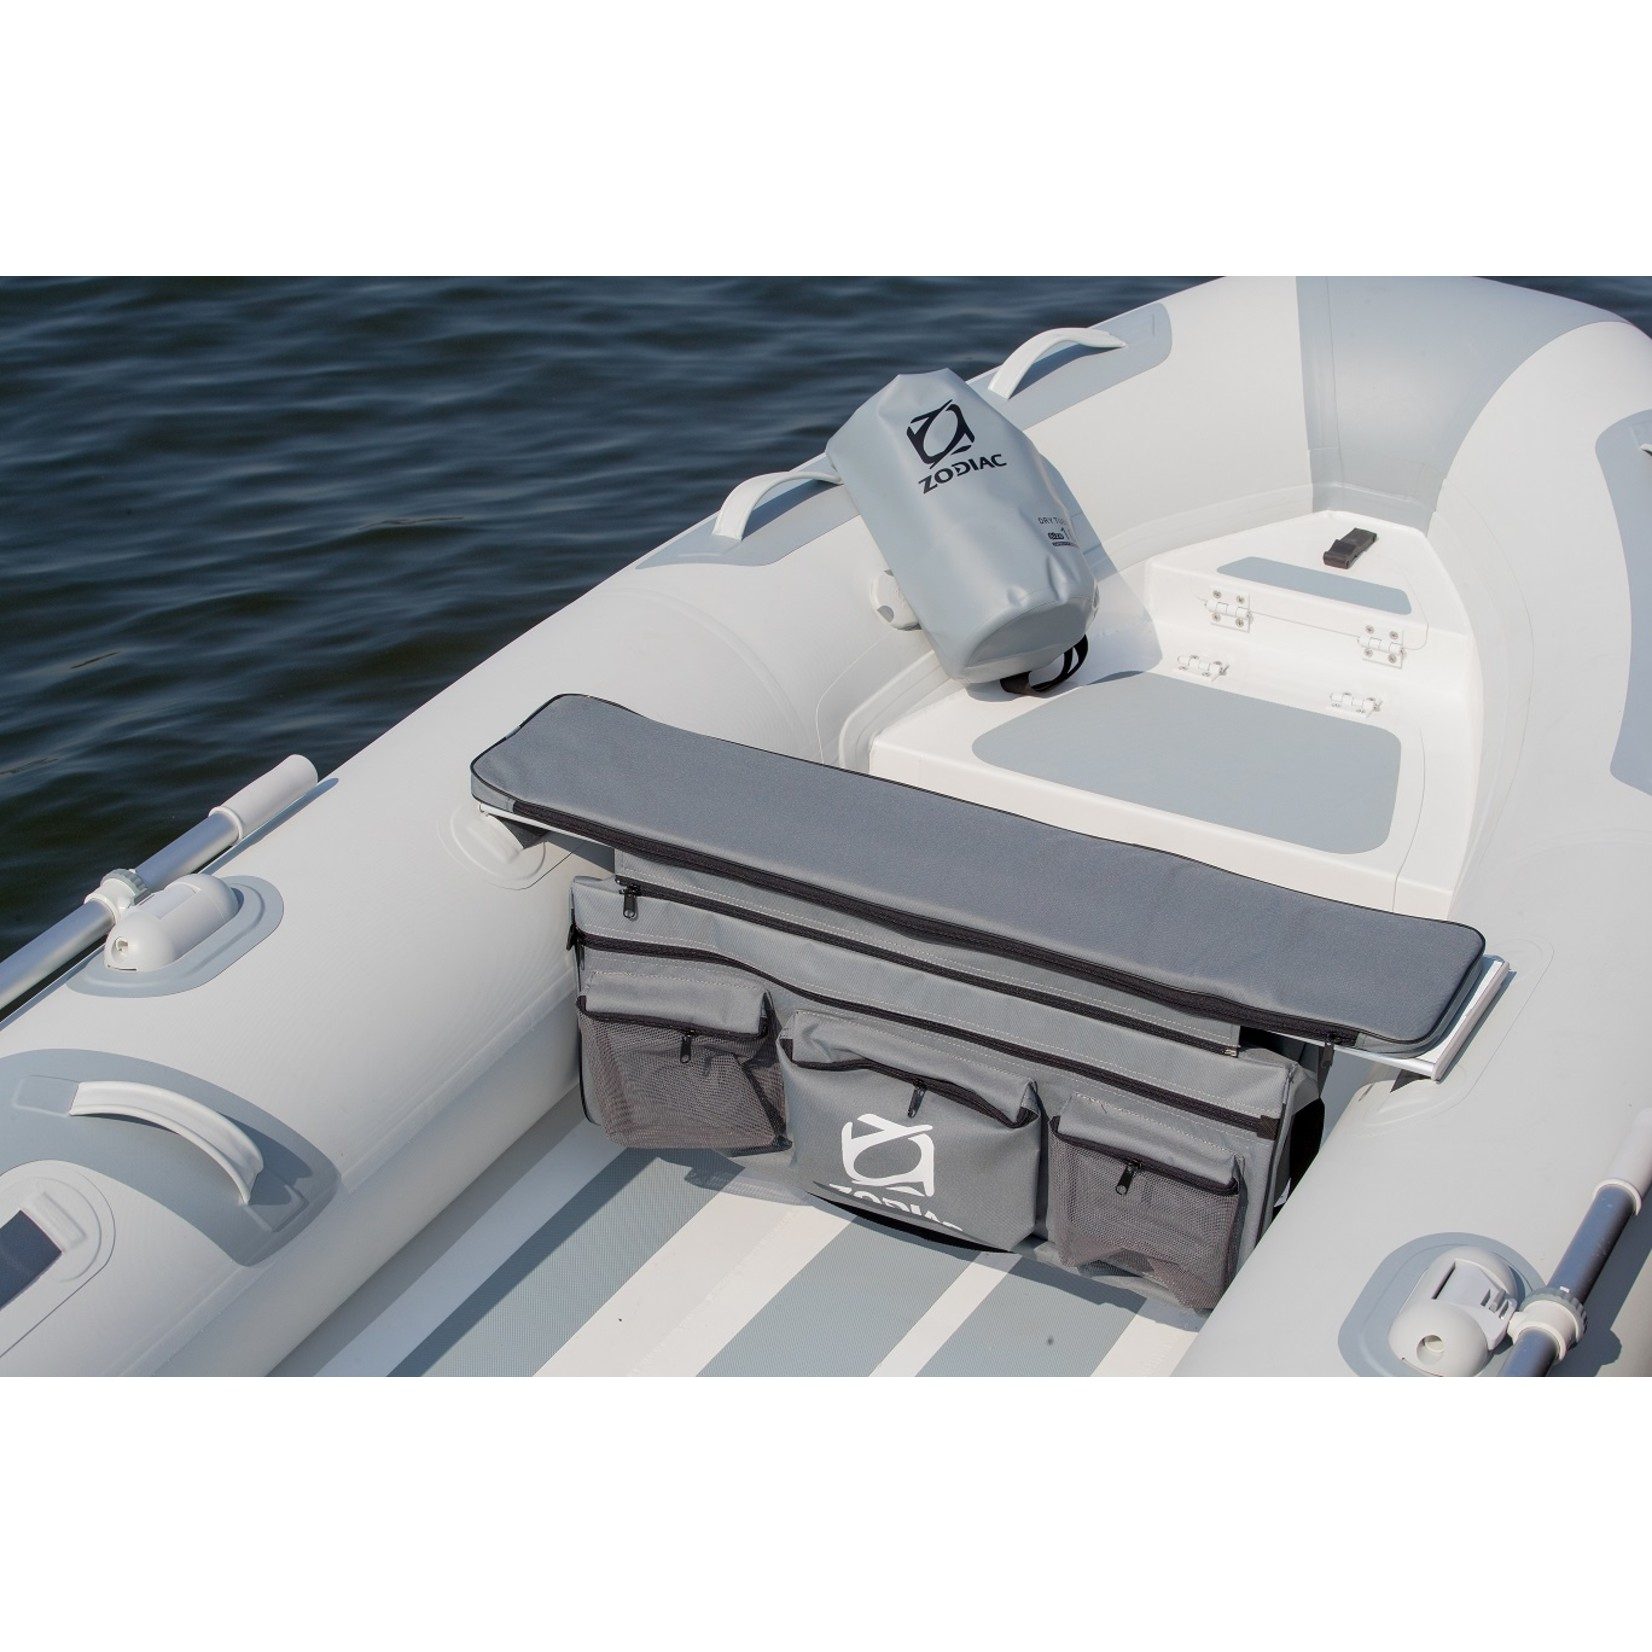 Zodiac Cadet 300 DL ALU RIB - Deck & Locker (3.03 m)